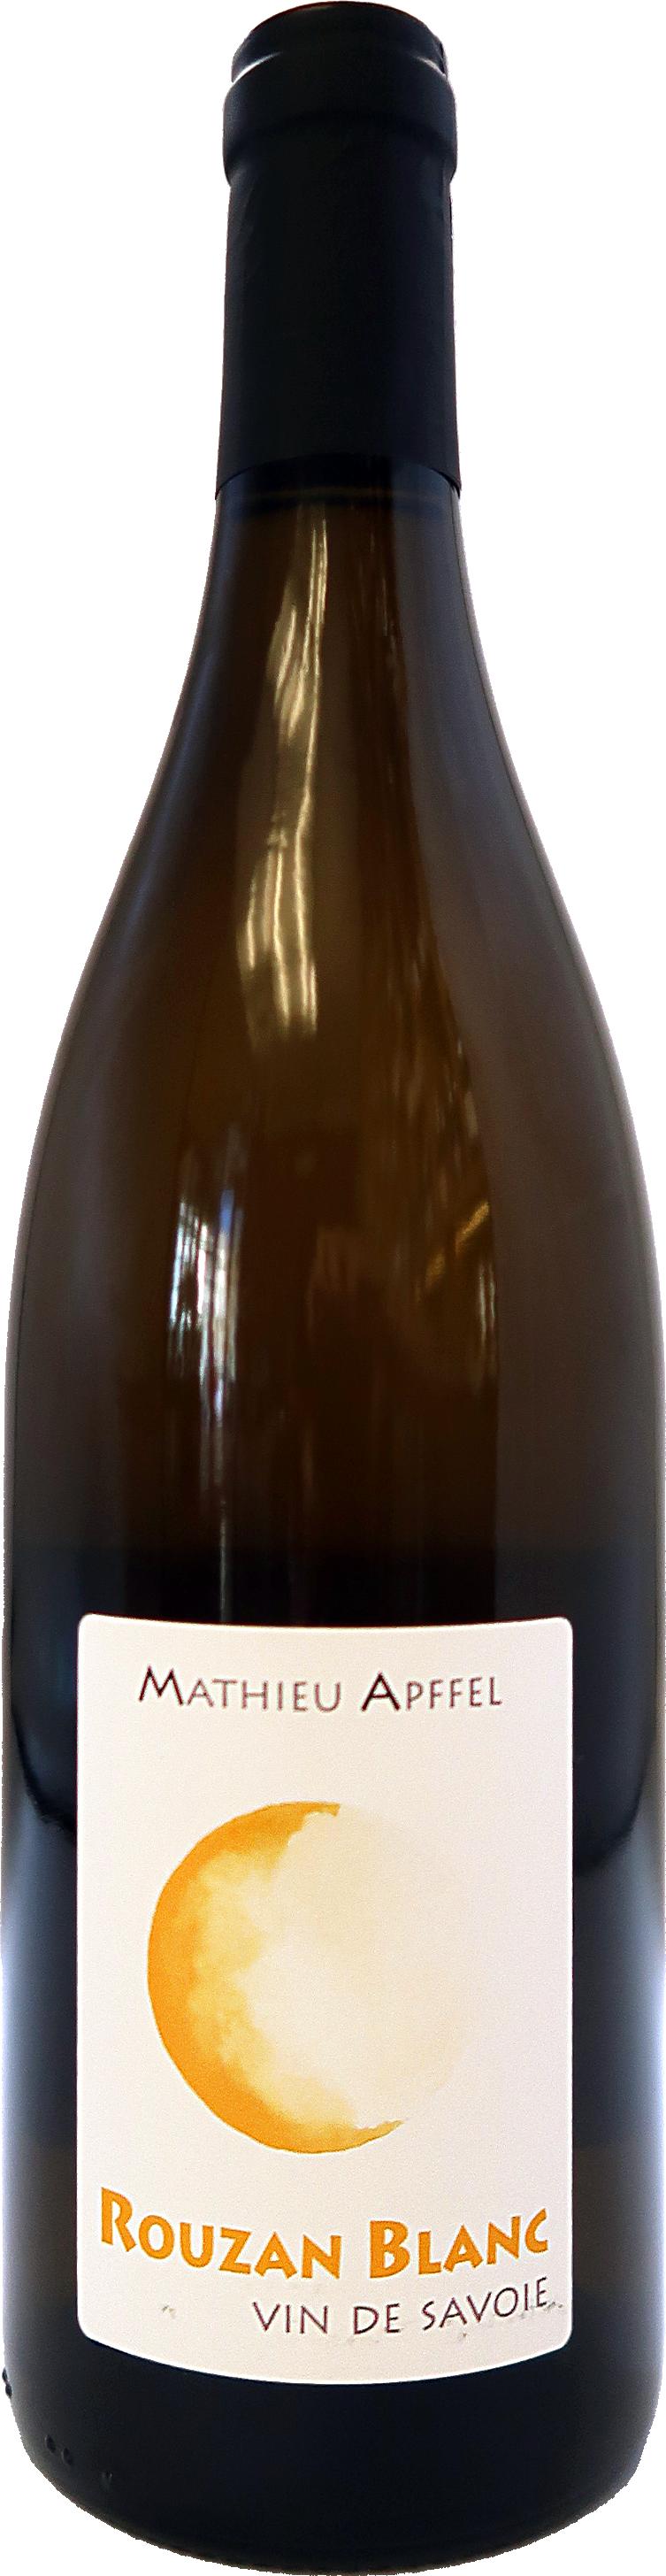 Rouzan Blanc - Mathieu Apffel - Vin de Savoie